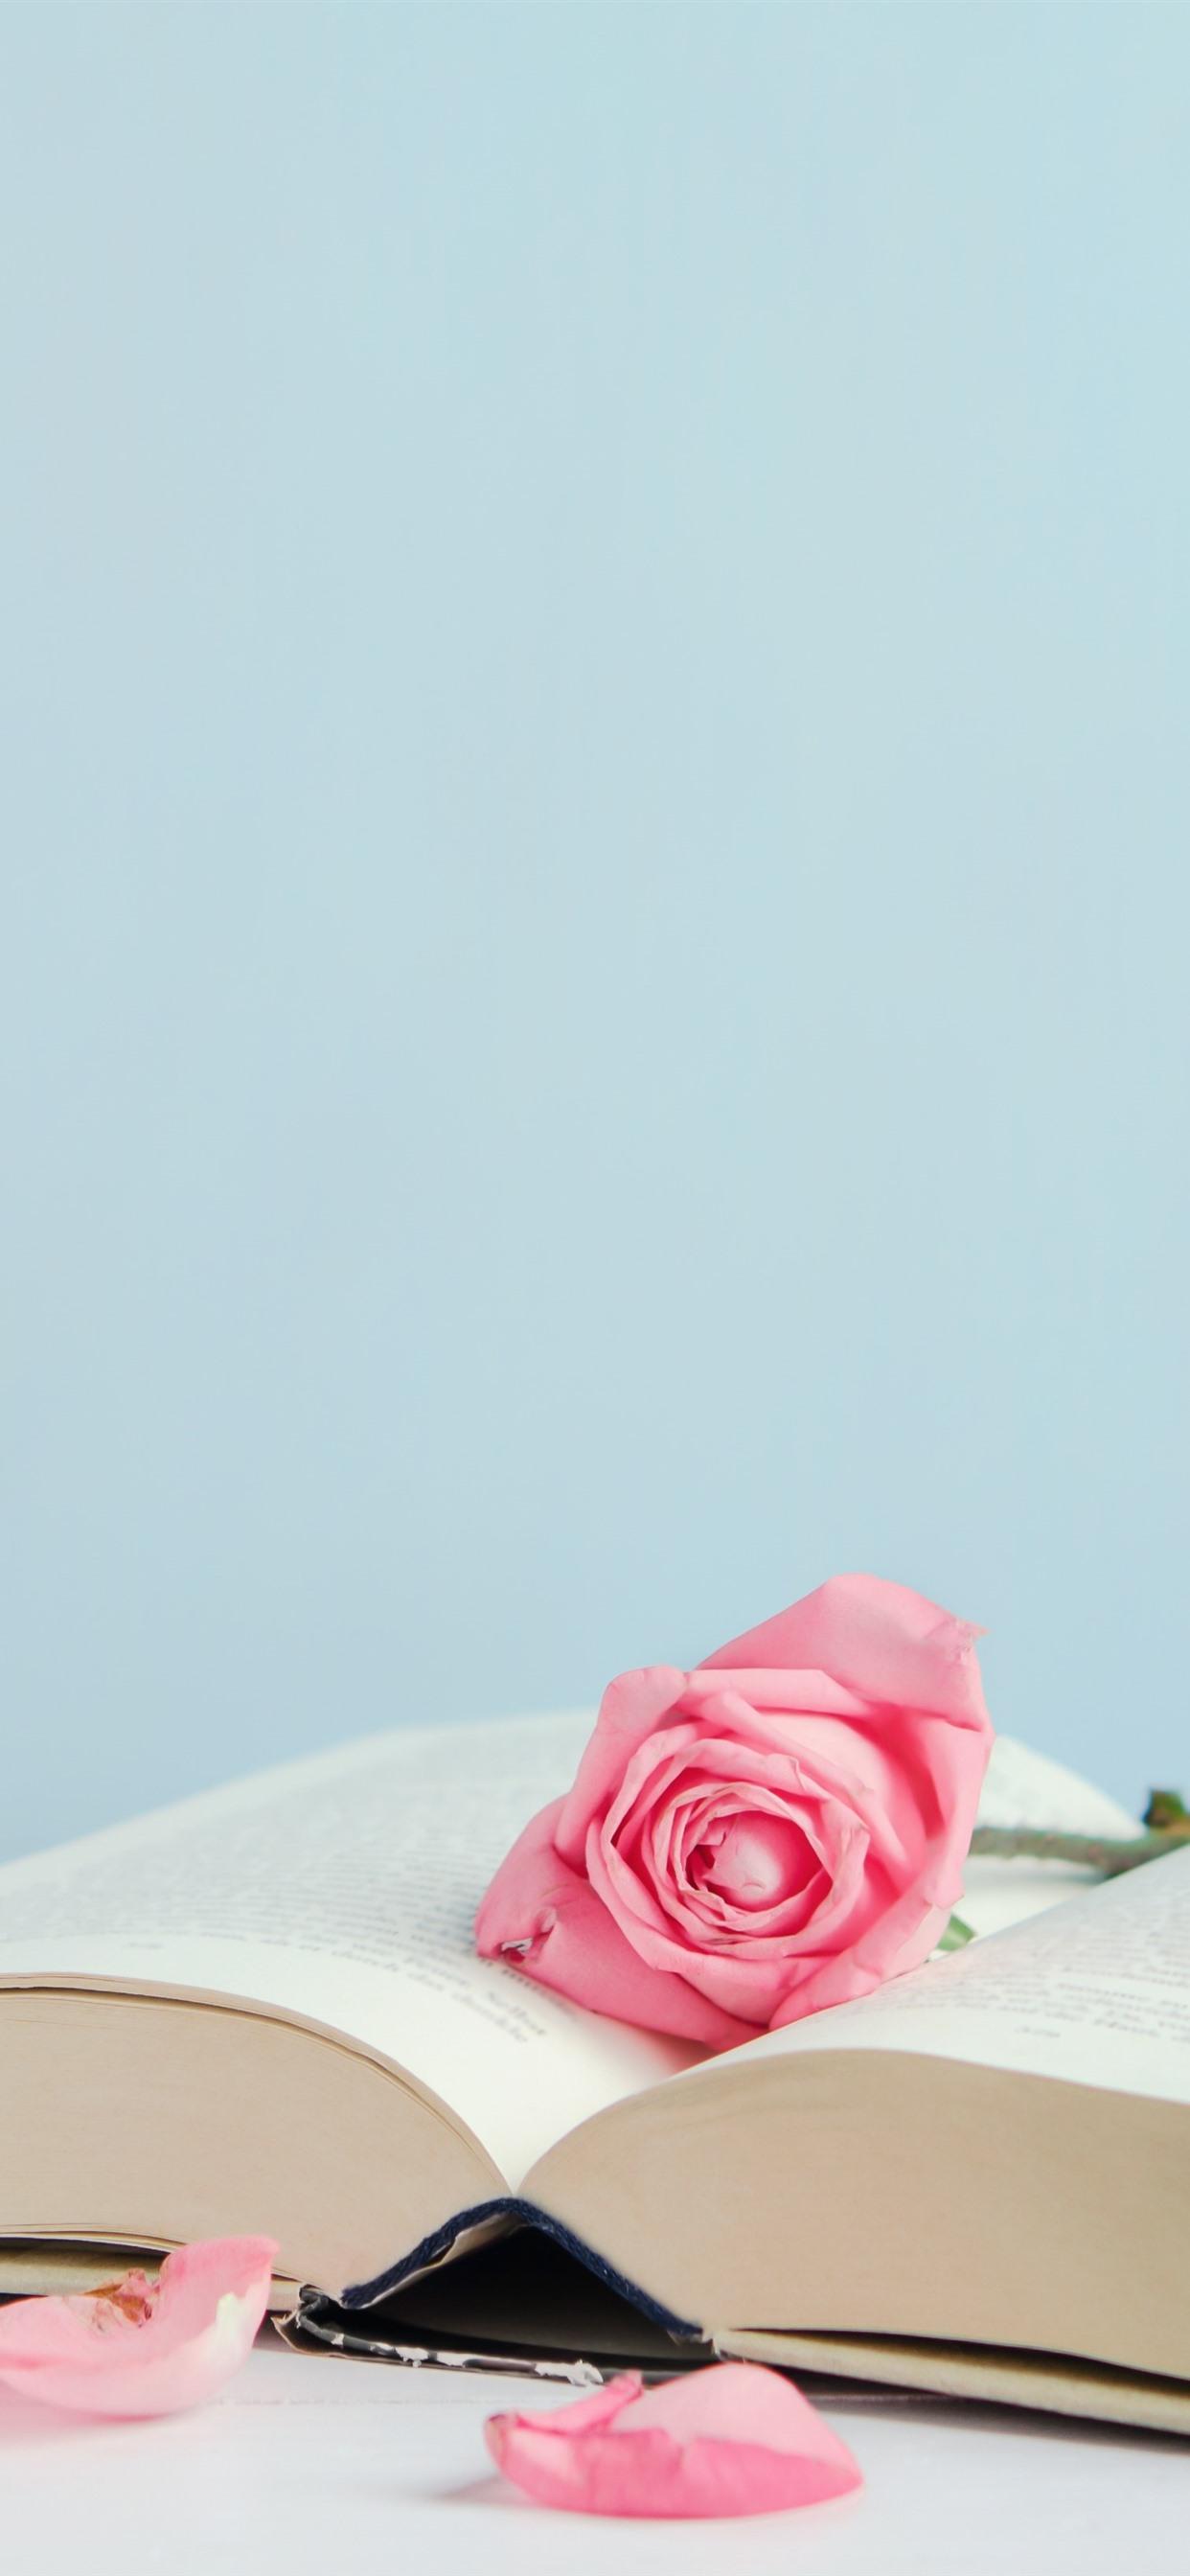 Book And Pink Roses Petals 1242x2688 Iphone Xs Max